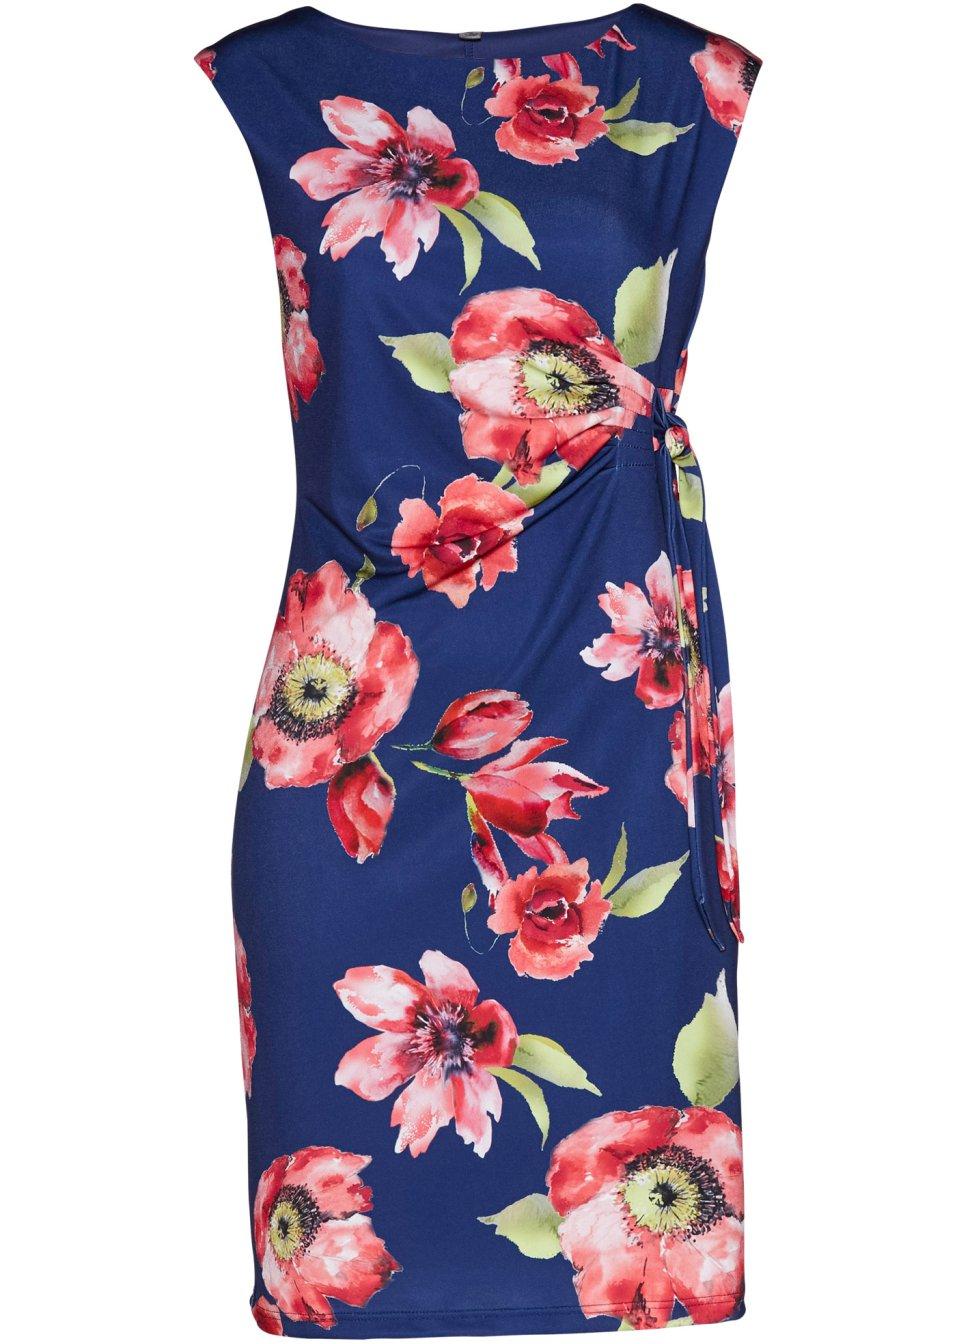 Kleid dunkelblau/granatrot geblümt - bpc selection online kaufen - bonprix.de mfSFn 67pkz